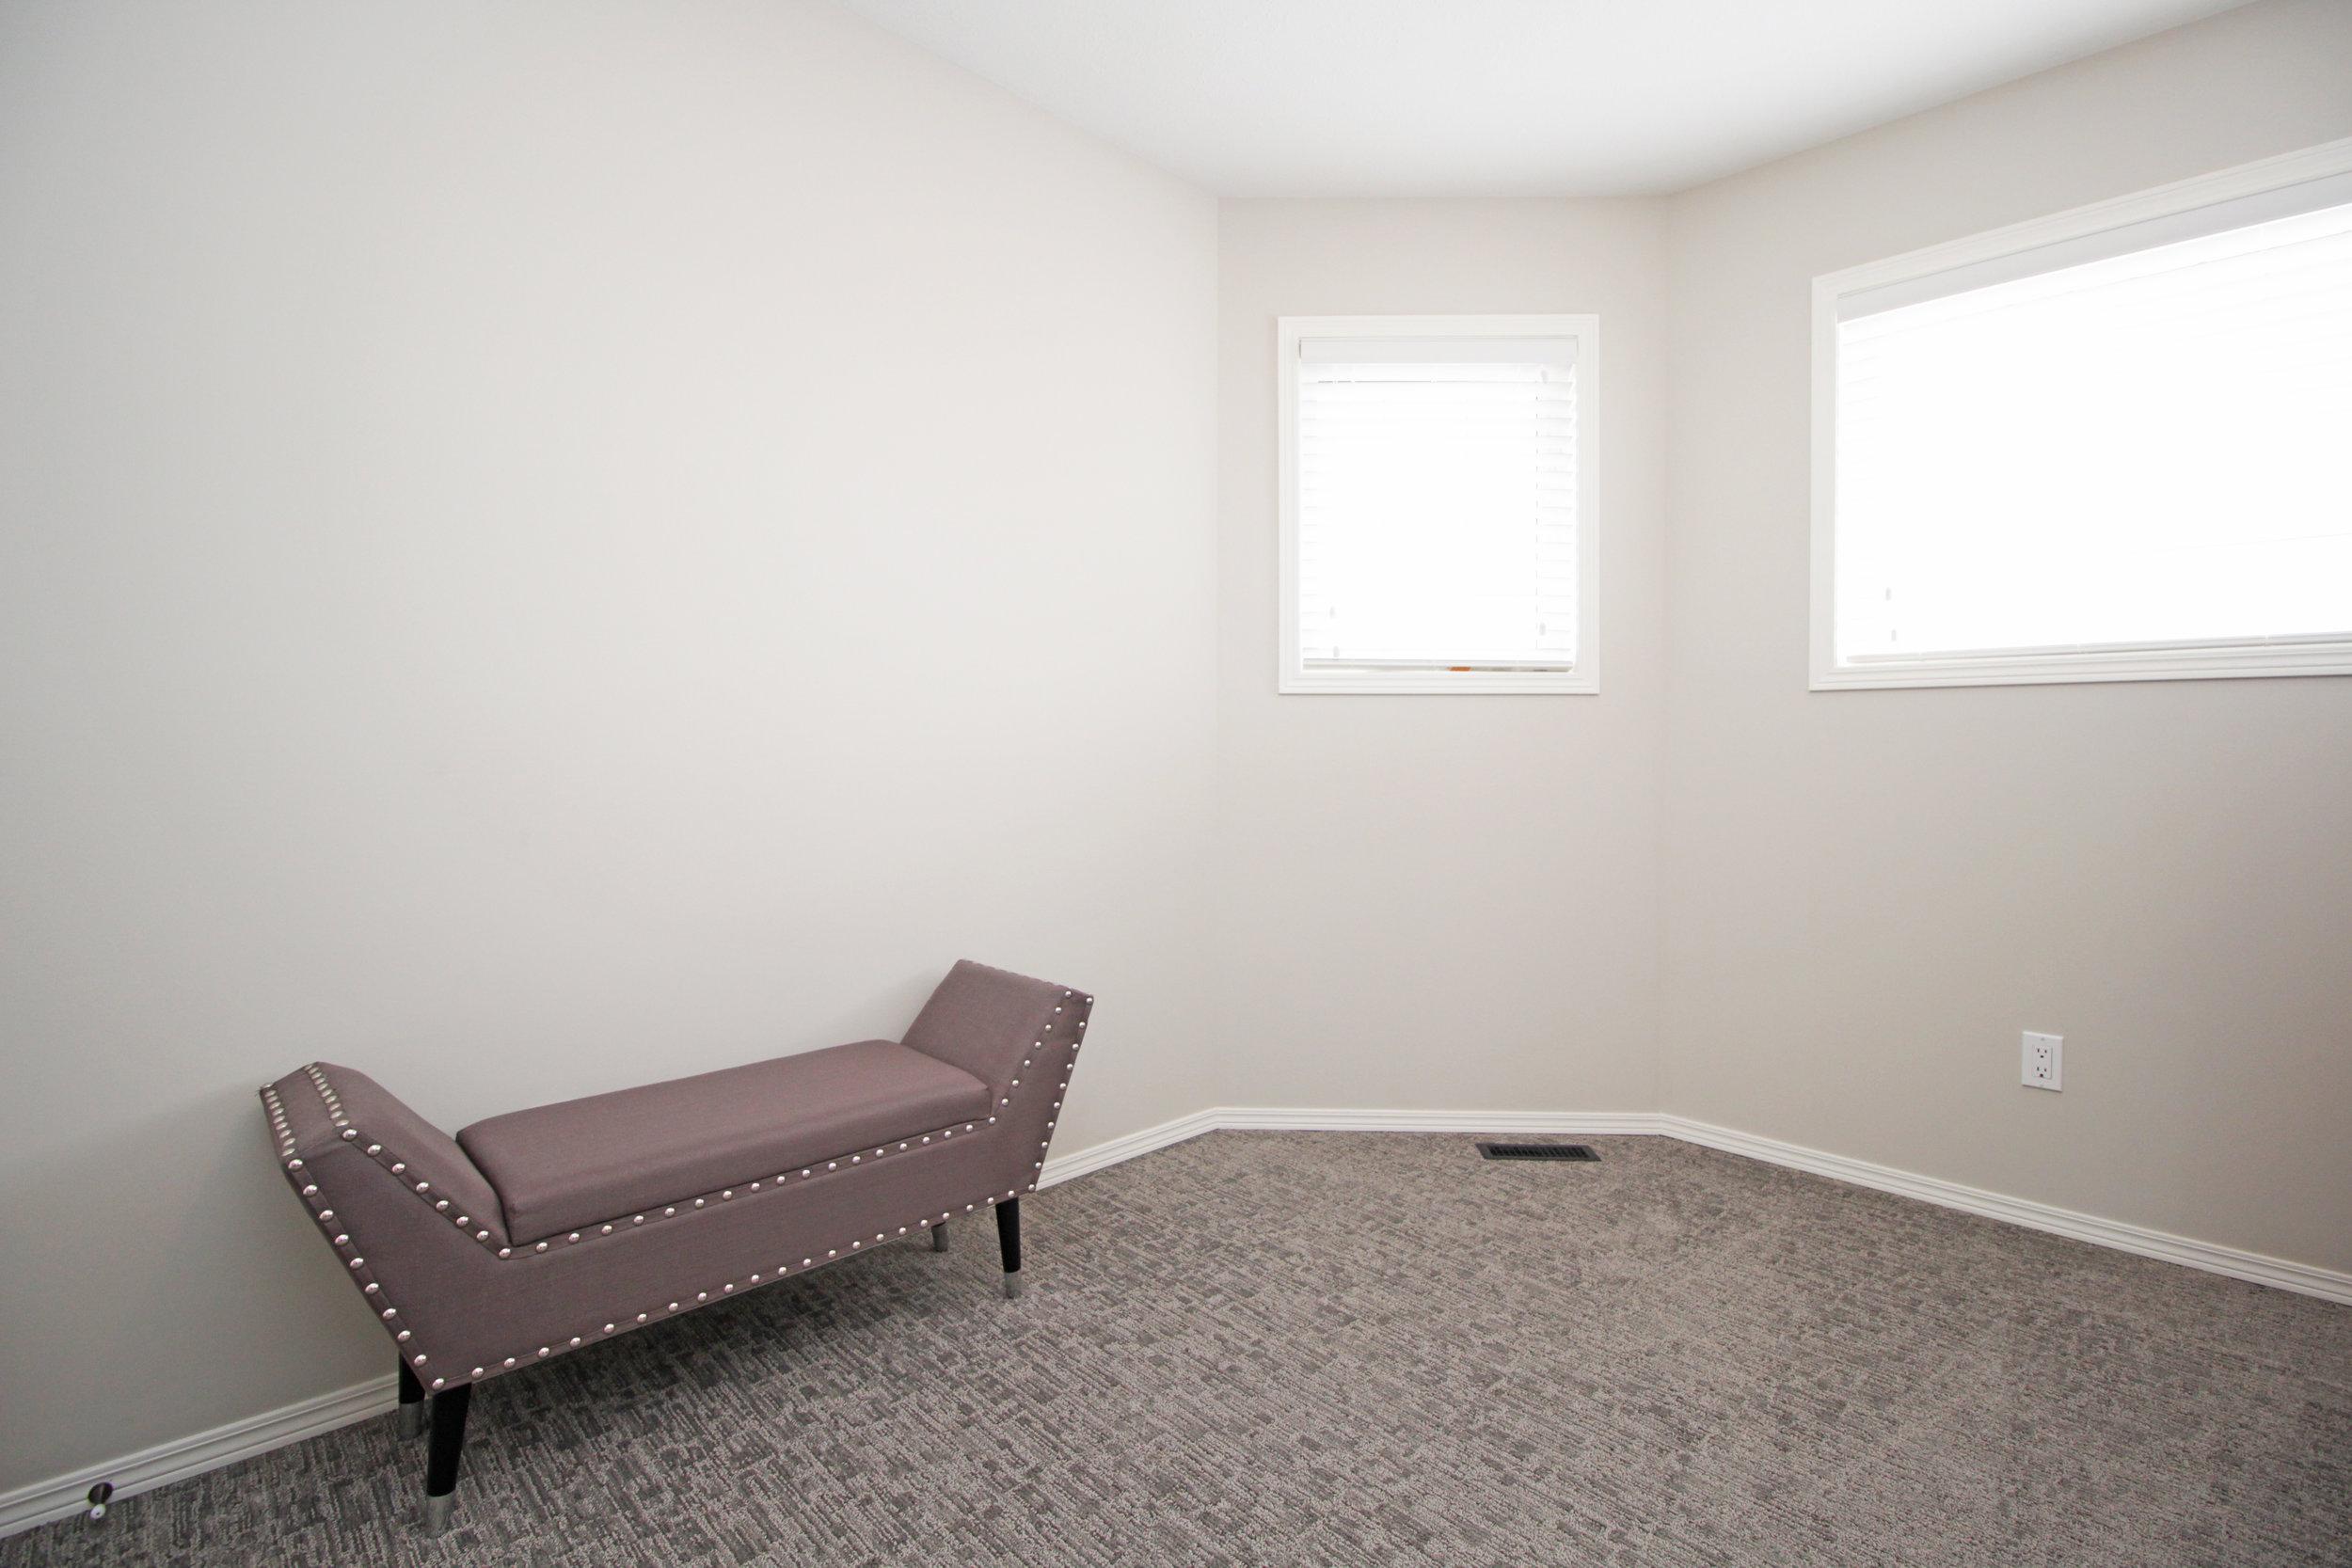 Bedroom?.jpg